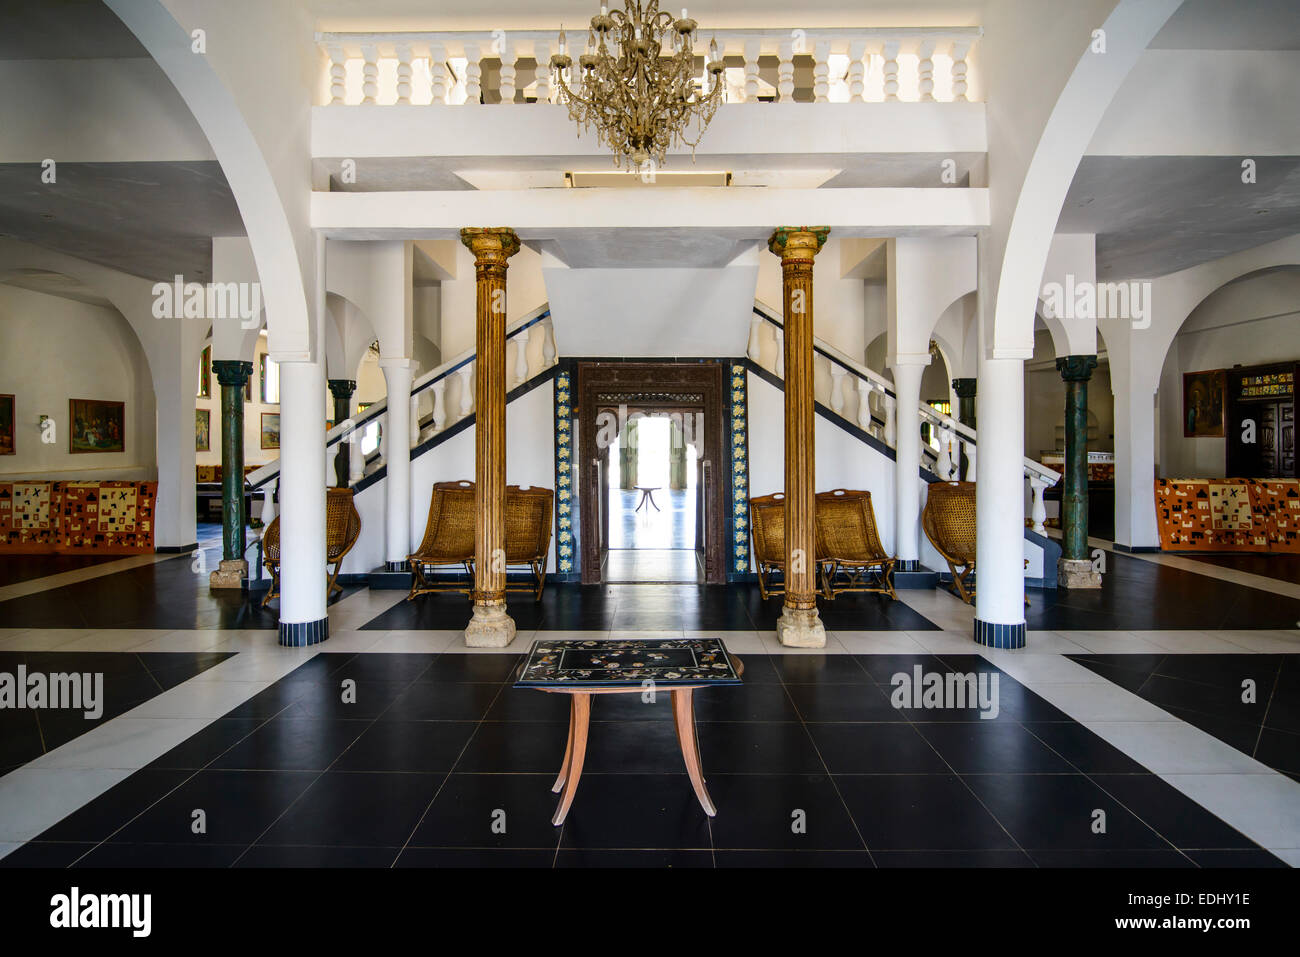 Foyer And Entrance Of The Windsor Hotel : Entrance hall of a luxury hotel massawa eritrea stock